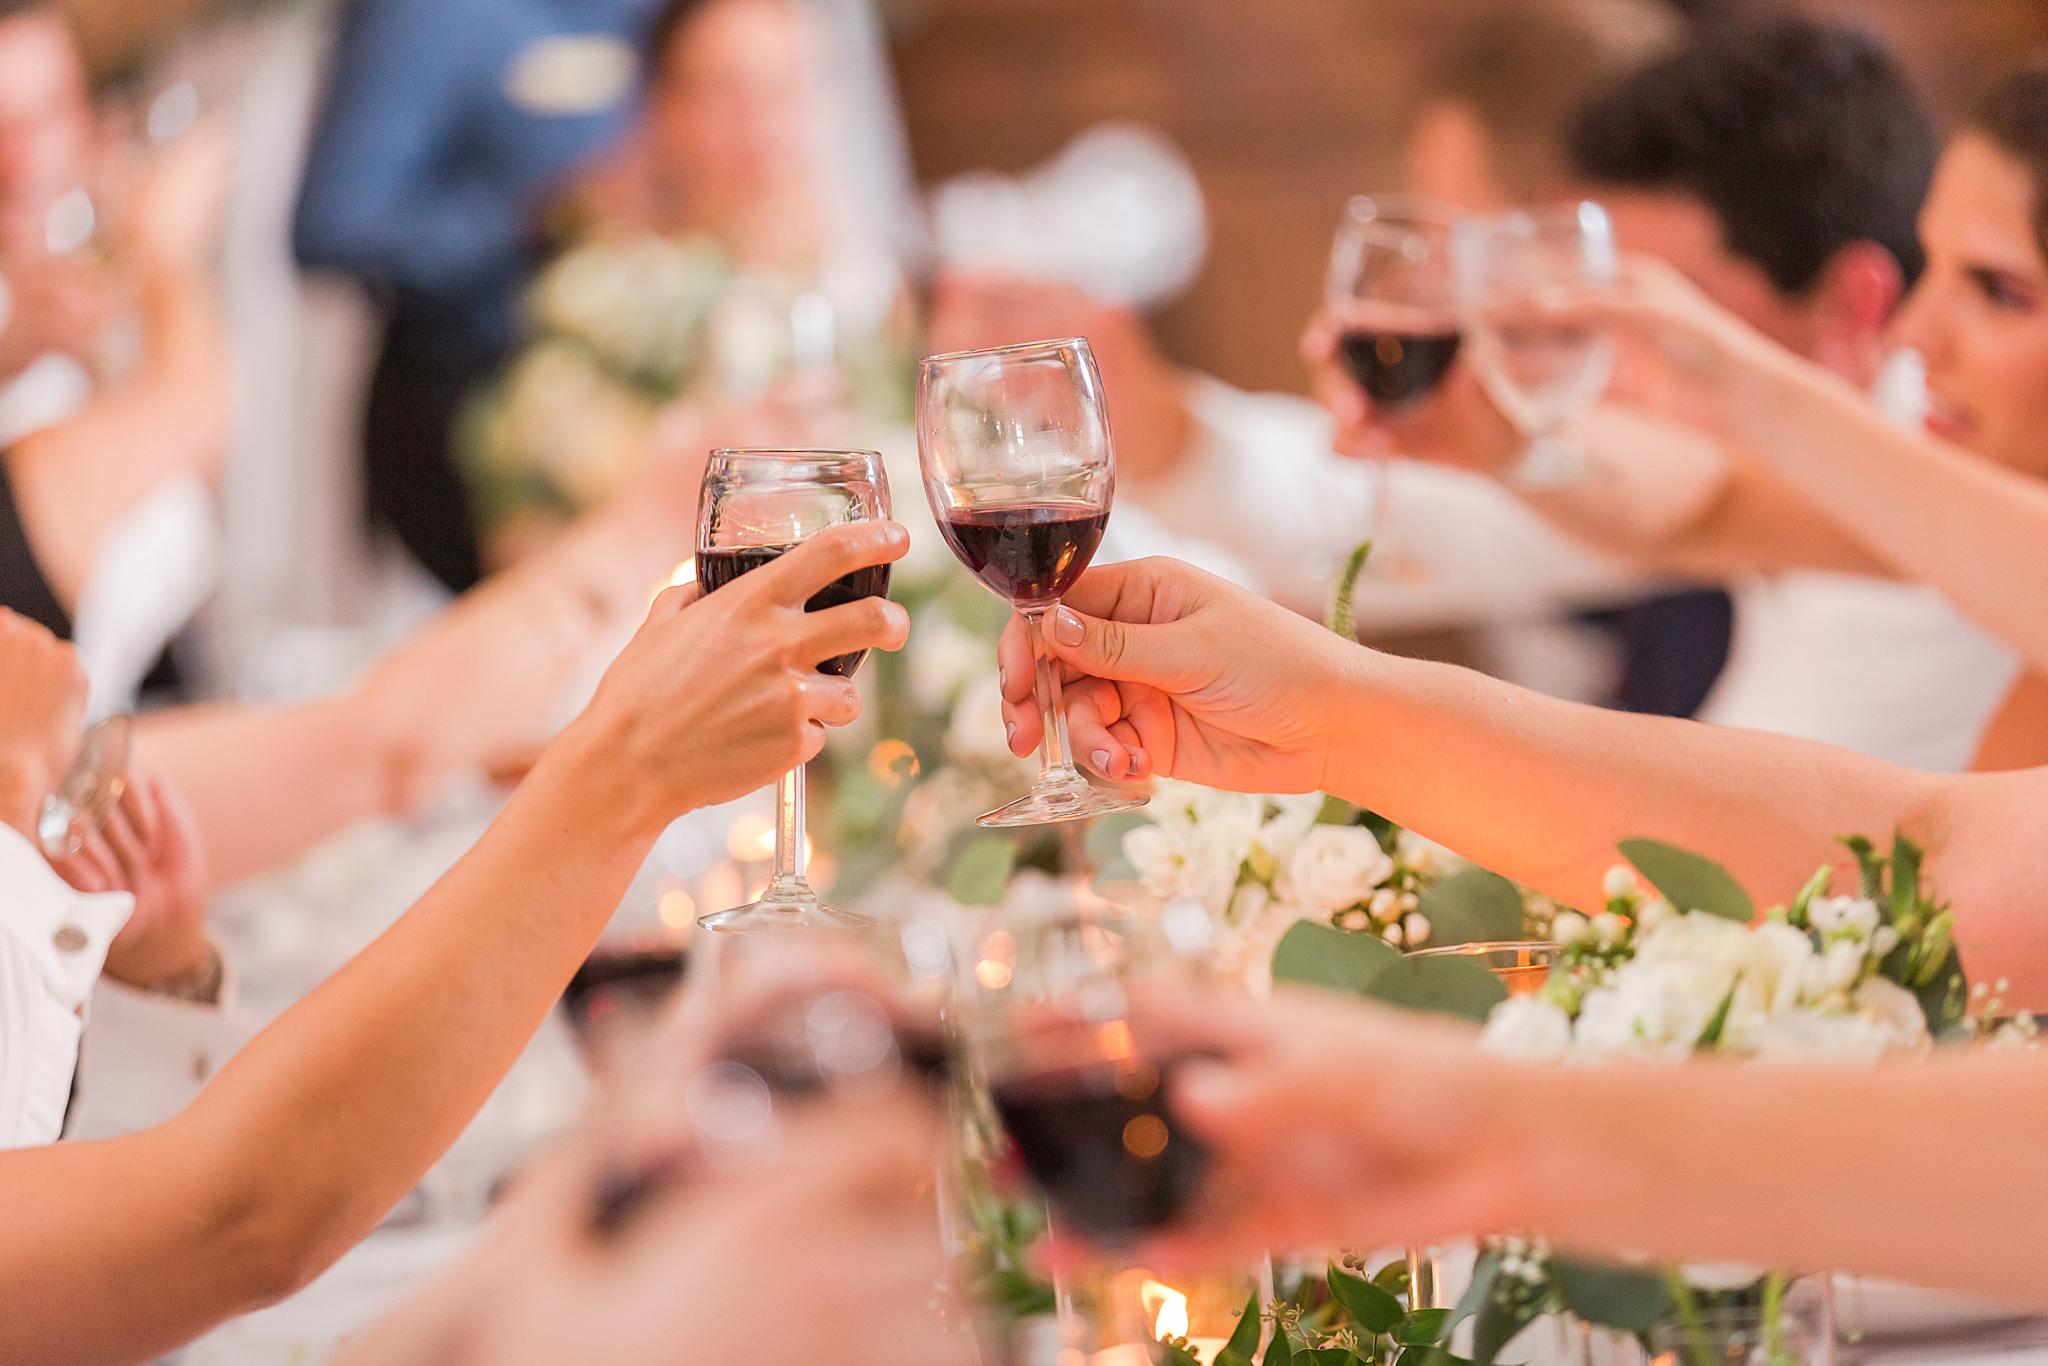 detroit-wedding-photographer-grosse-pointe-academy-chapel-detroit-golf-club-wedding-carly-matt-by-courtney-carolyn-photography_0101.jpg